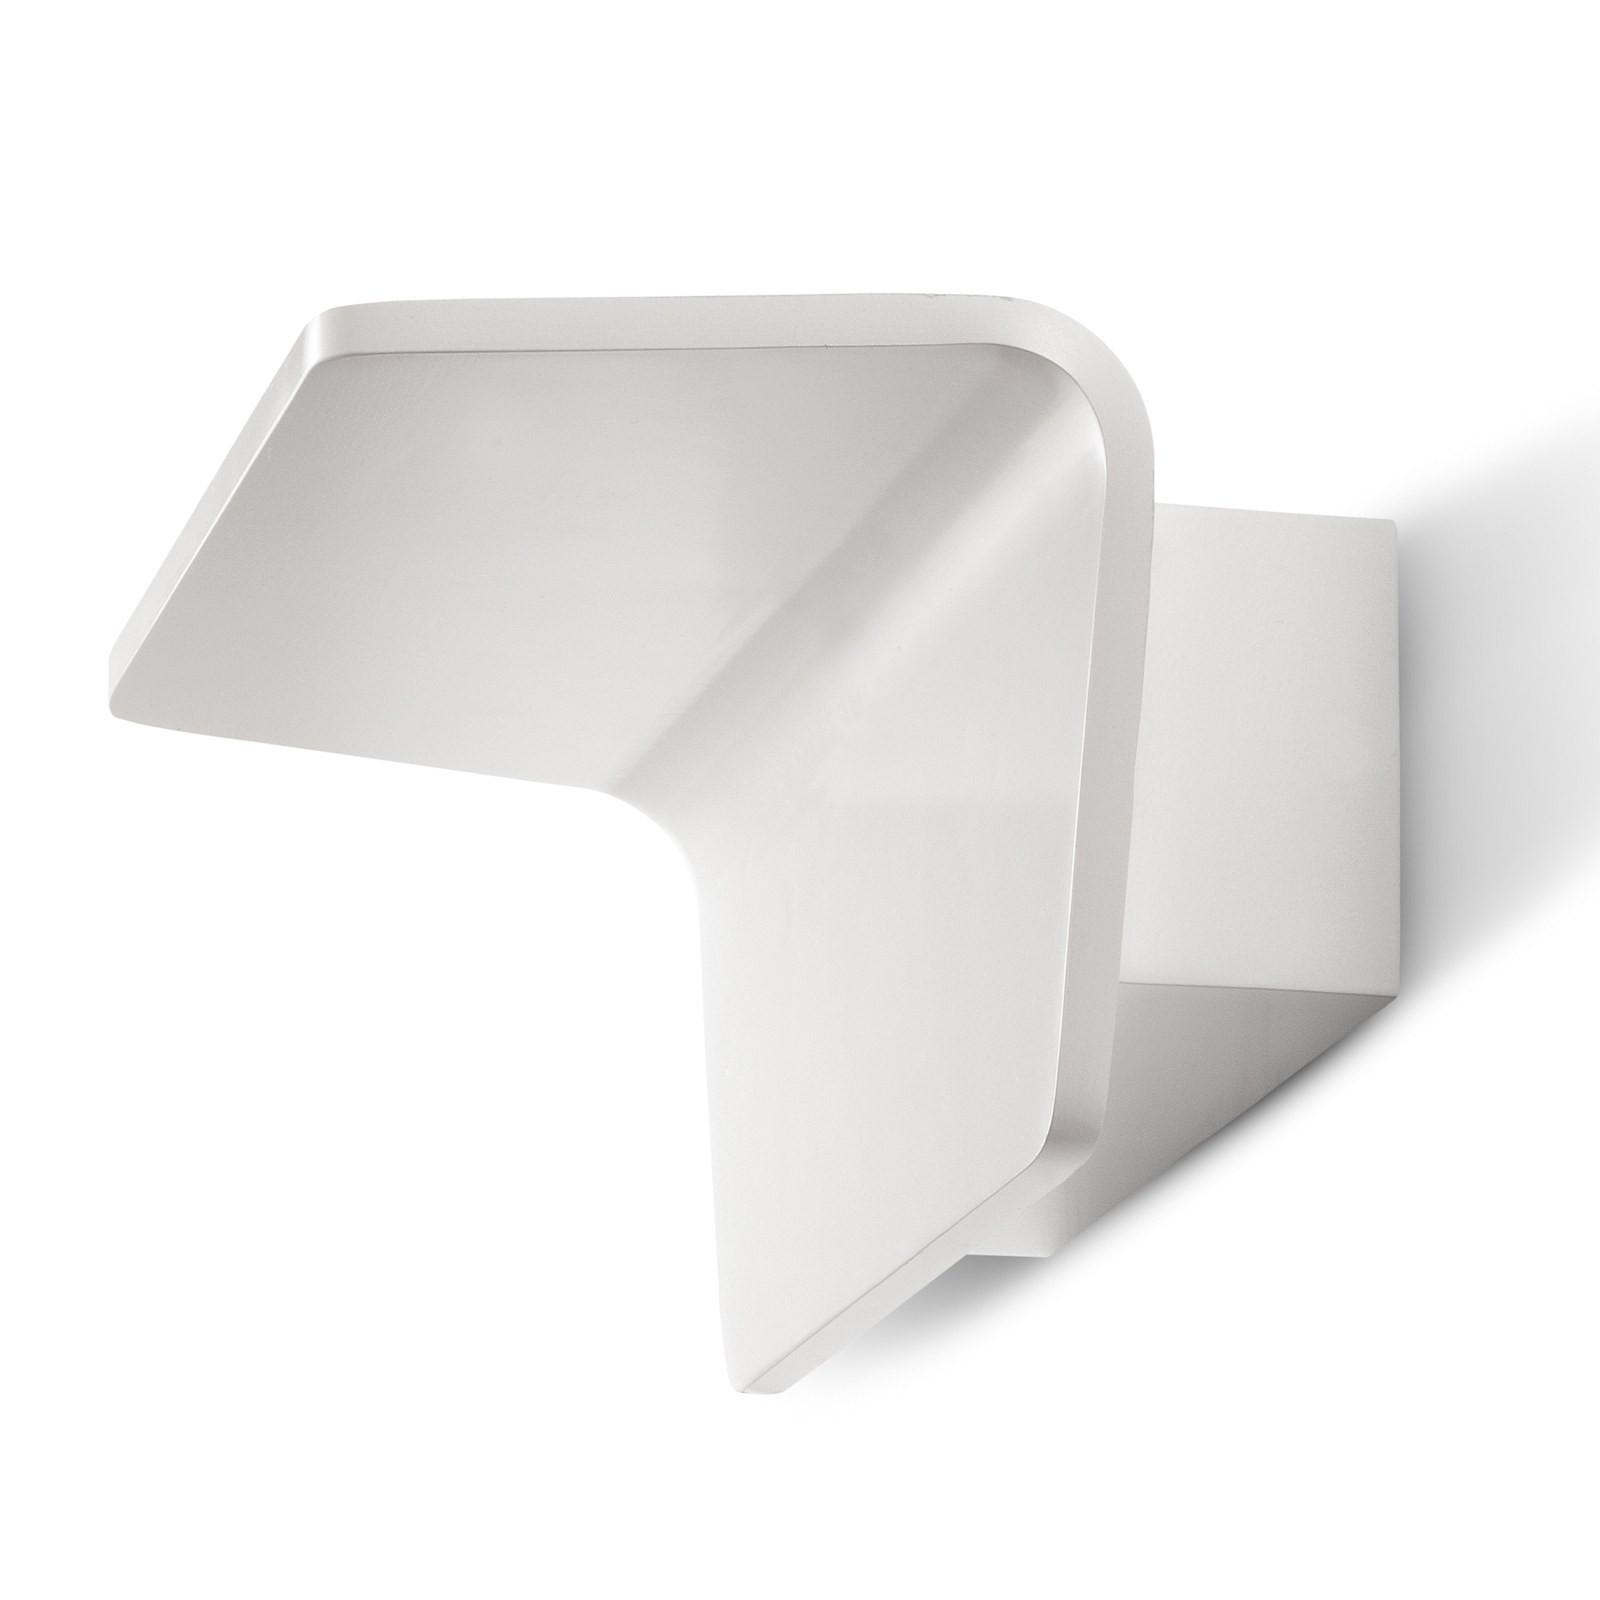 Applique lampada da parete a led 18w in acciaio luce calda nelson pan corridoio area illumina - Applique da parete led ...